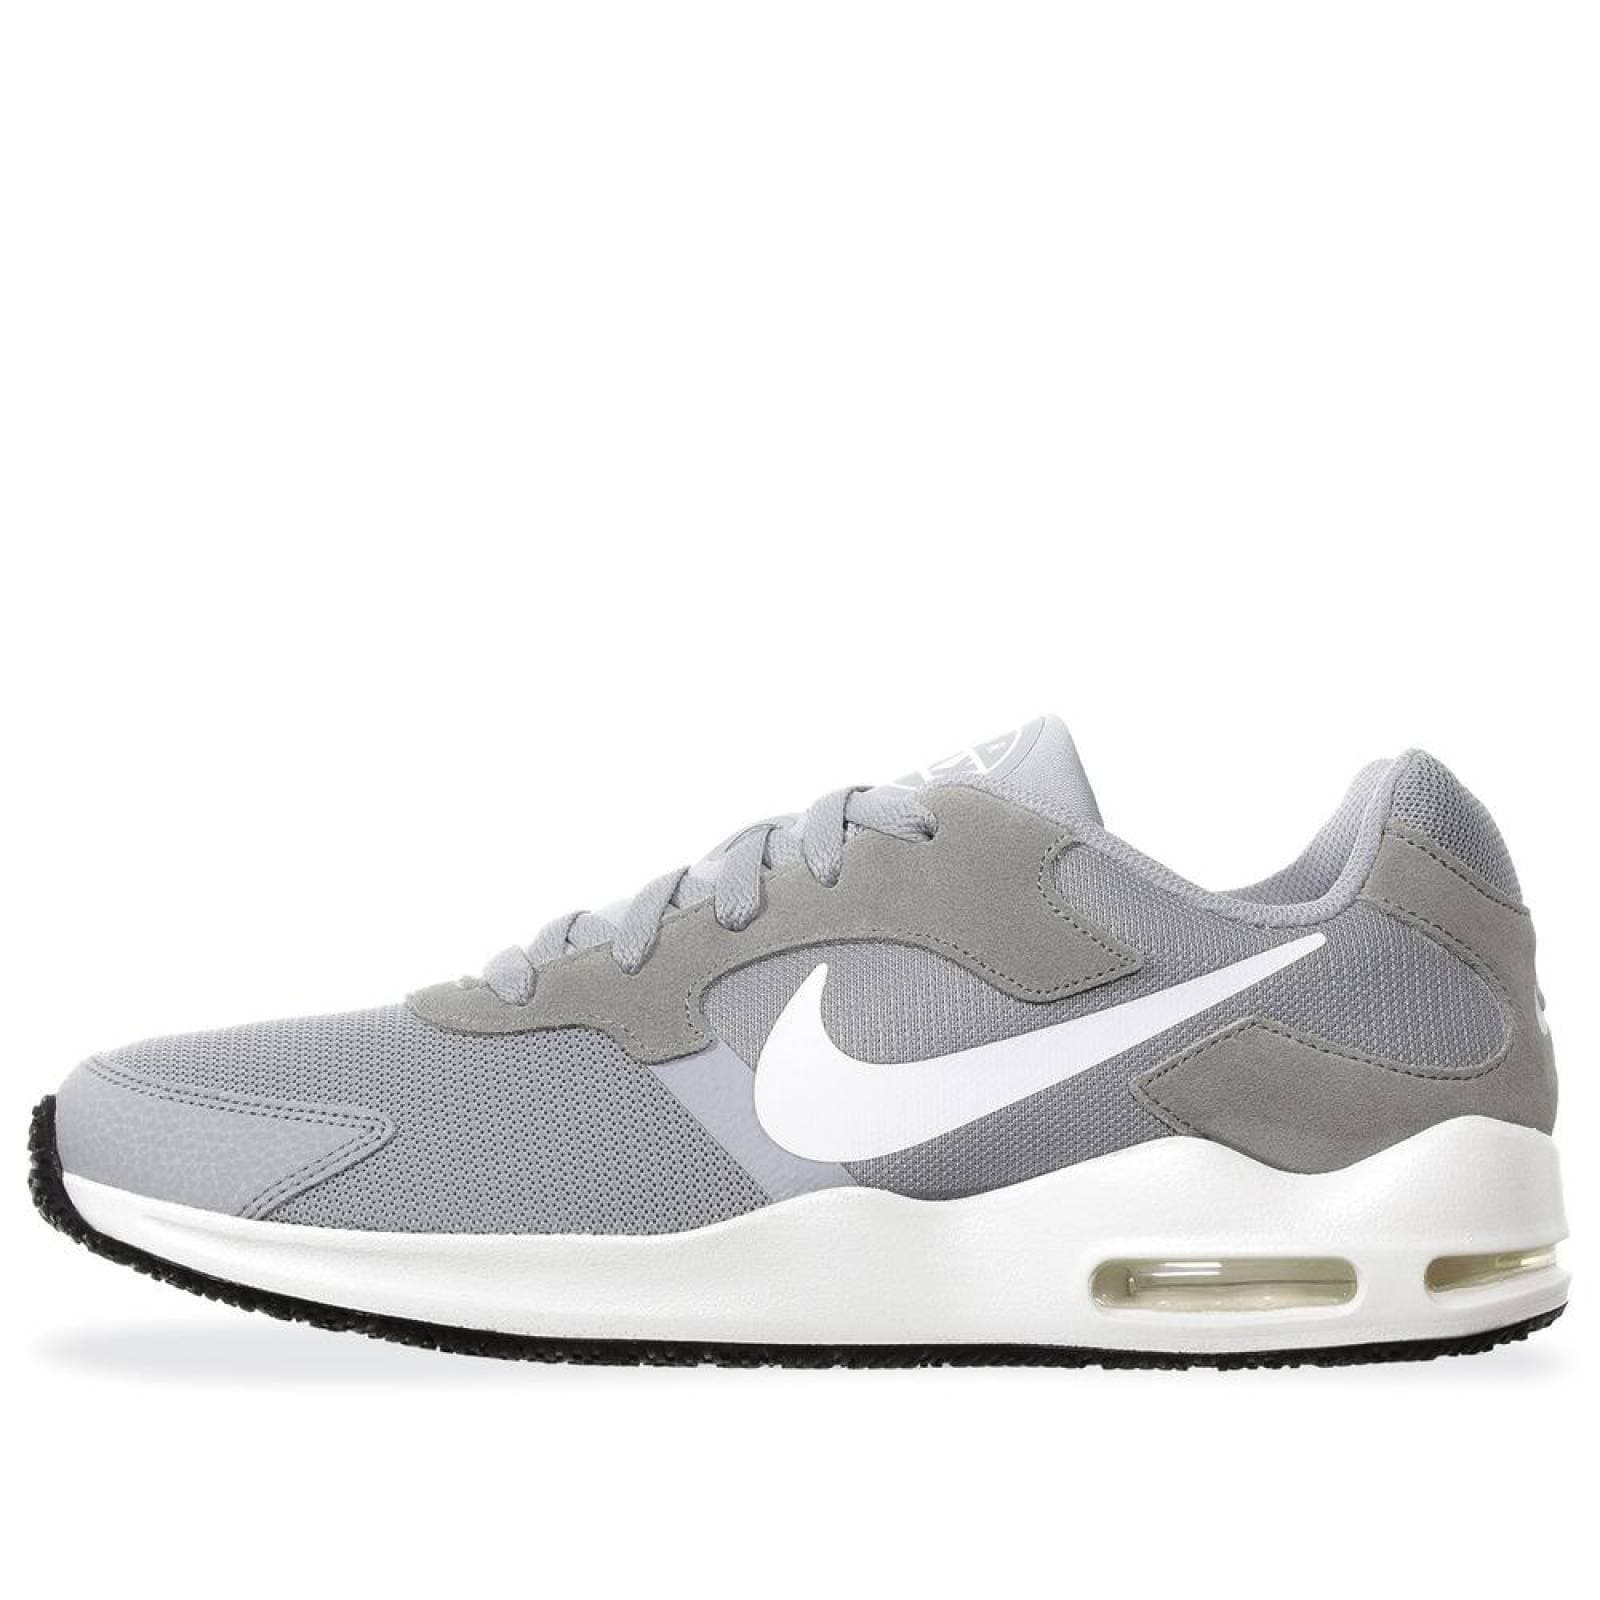 Tenis Nike Air Max Guile 916768001 Gris Claro Hombre